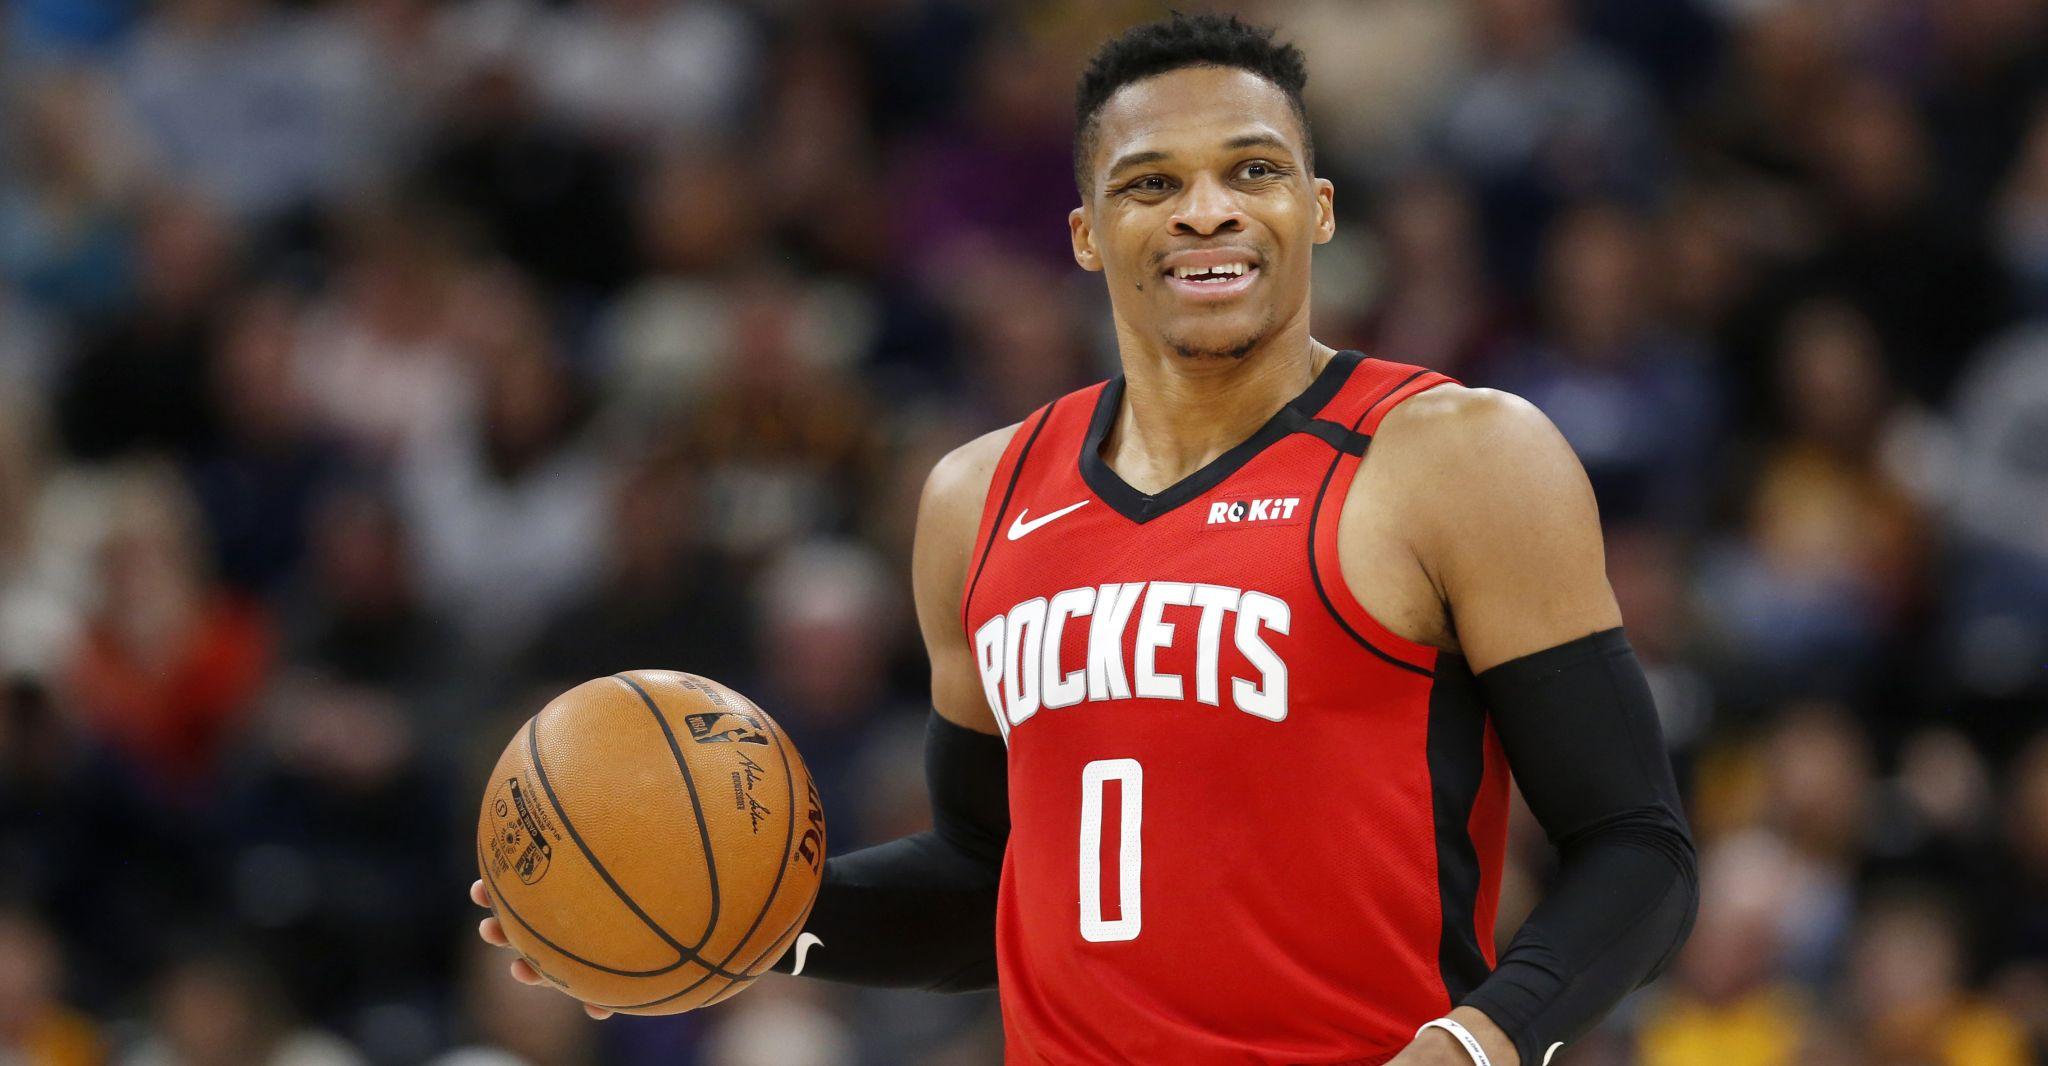 3-pointers: Takeaways from Rockets' win over Jazz